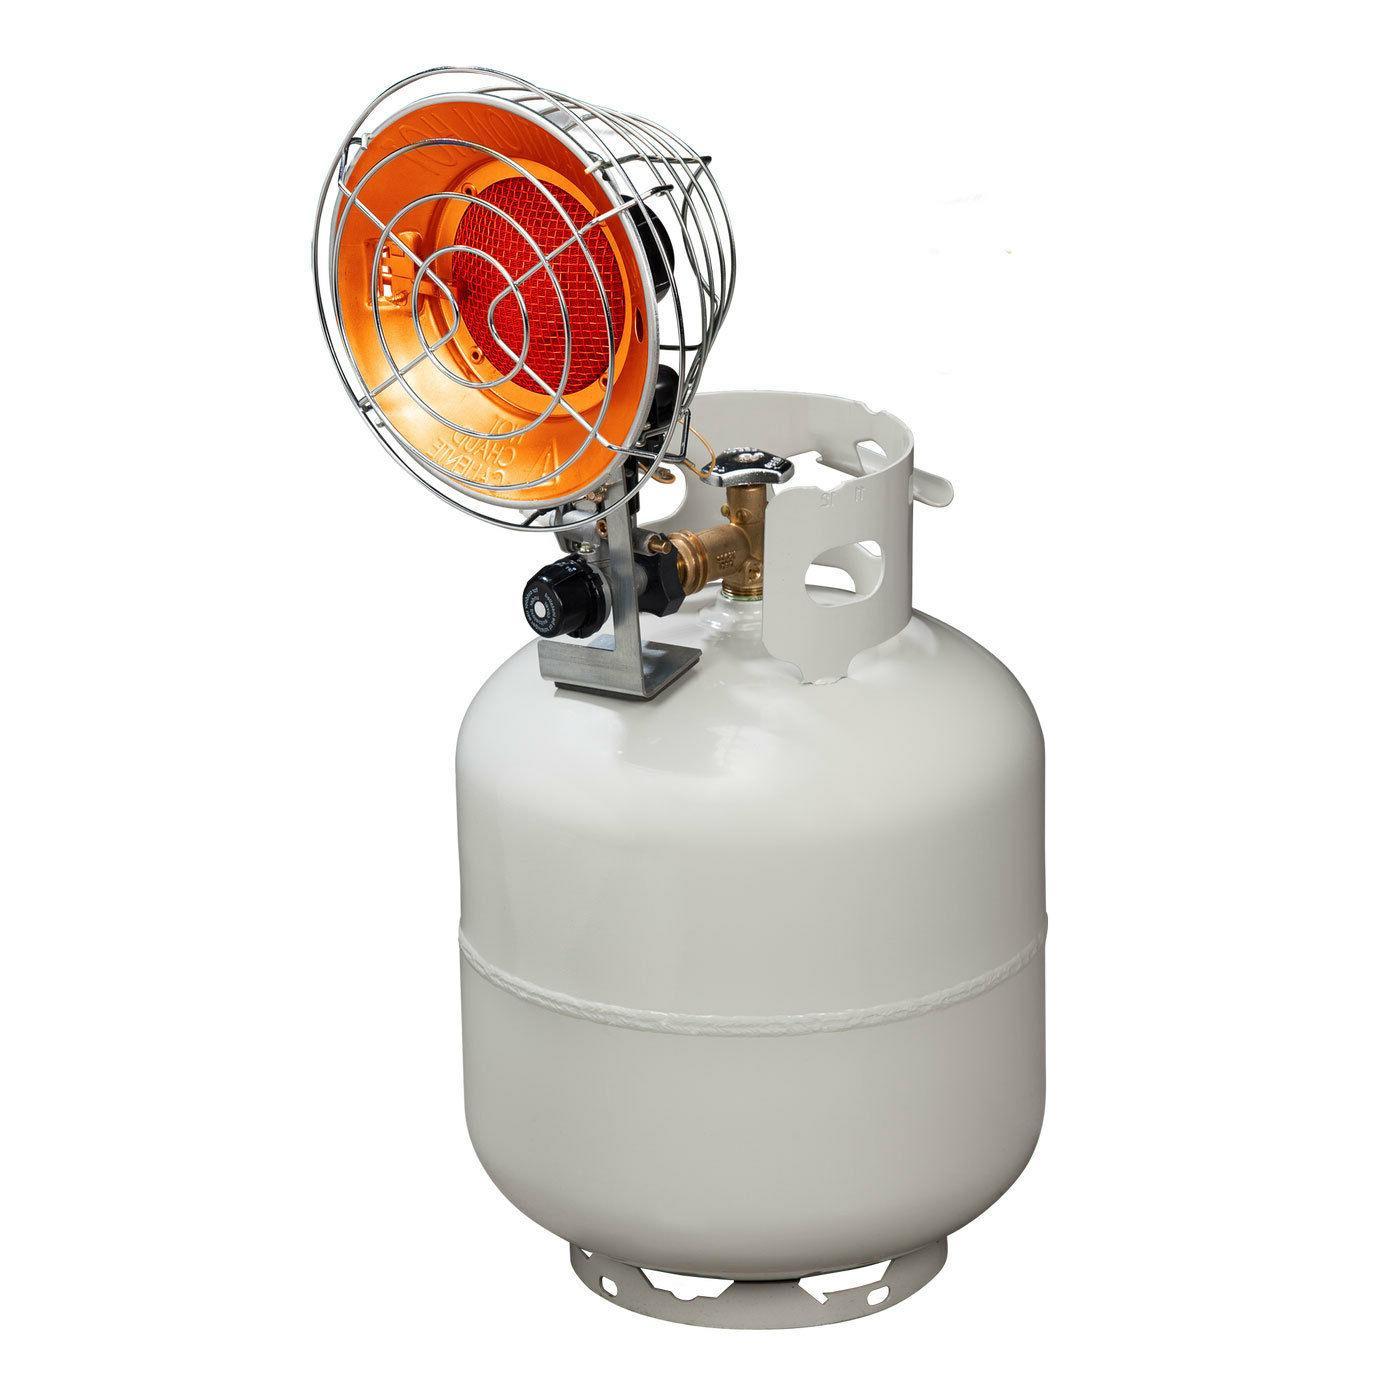 tank top propane heater single burner 15